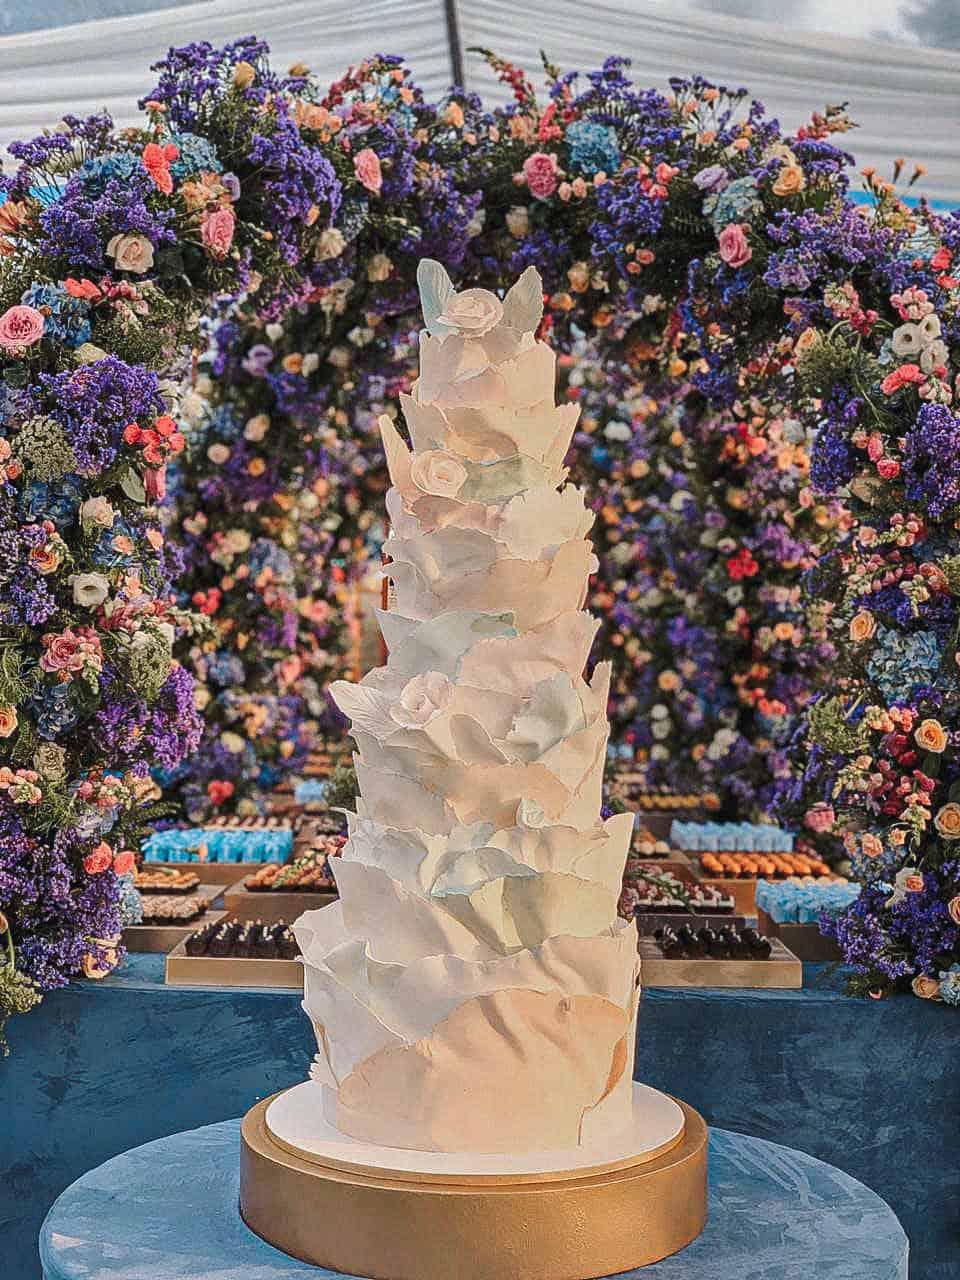 Casa-da-Maria-casamento-Mariana-e-Luan-Castelhanos-cerimonial-Vivianne-Melo-Espirito-Santo-Fotografia-Mariana-Andrich67